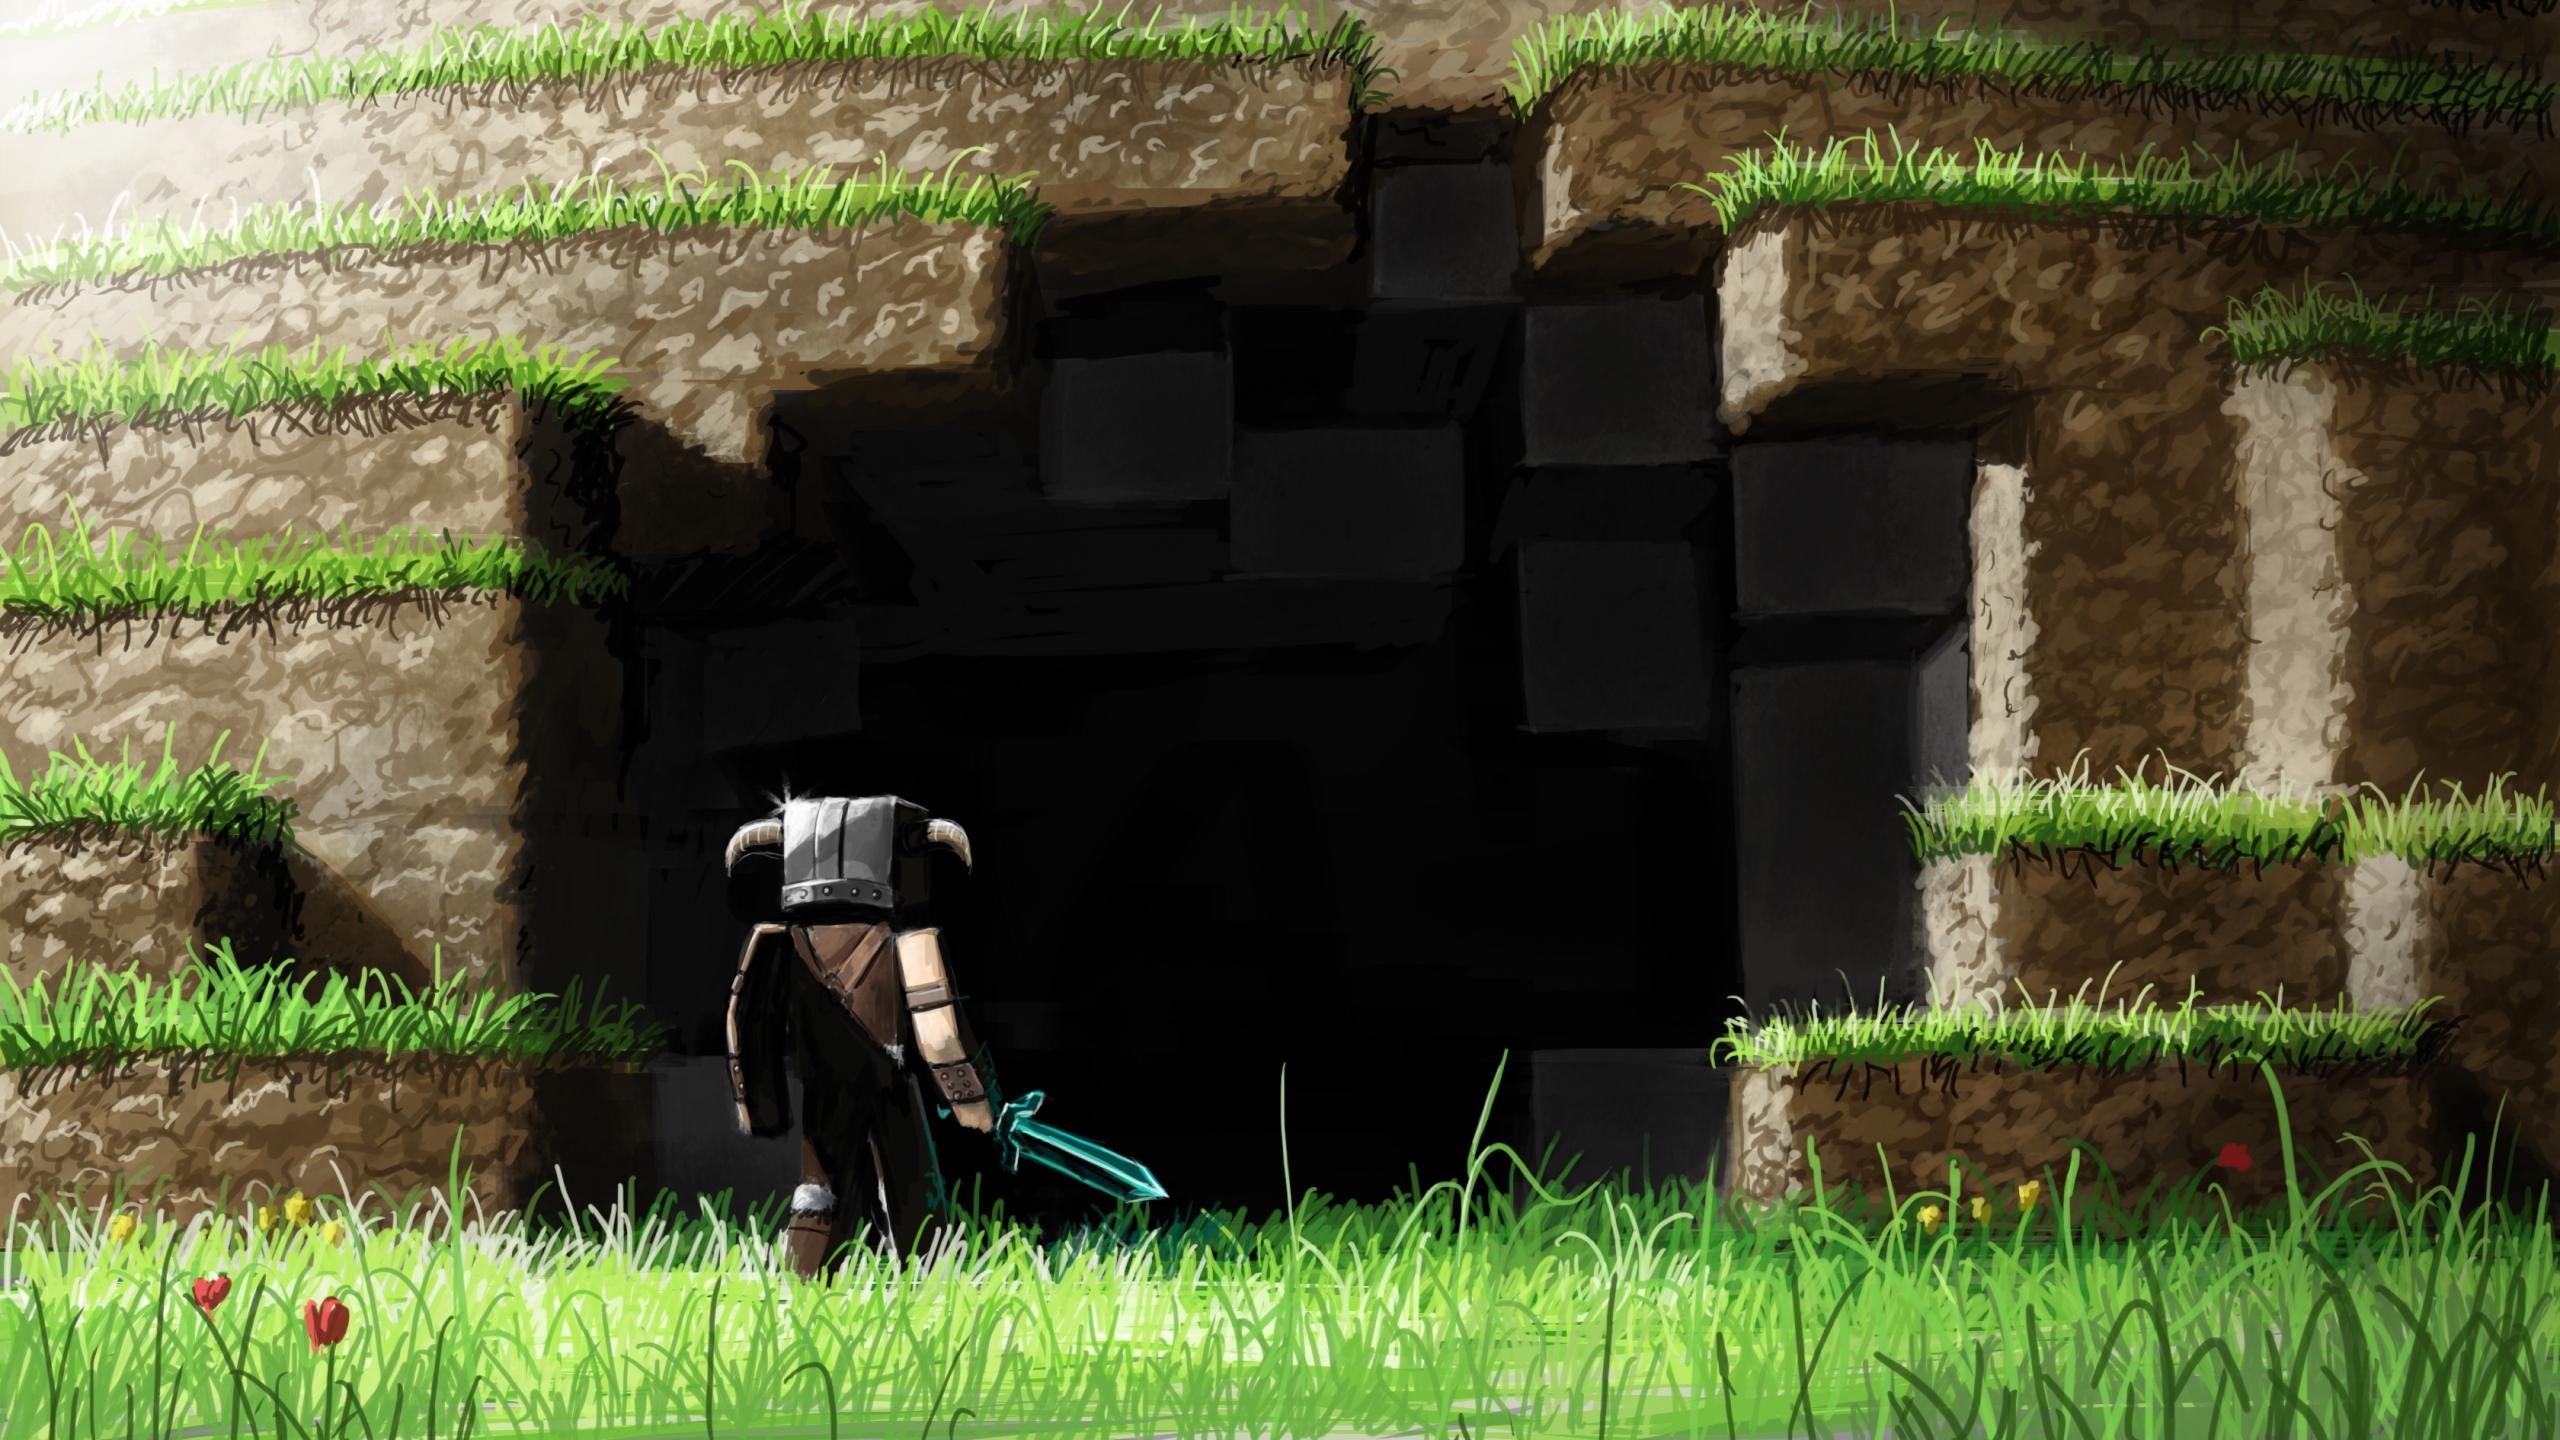 2560x1440 Minecraft 1440p Resolution Wallpaper Hd Games 4k